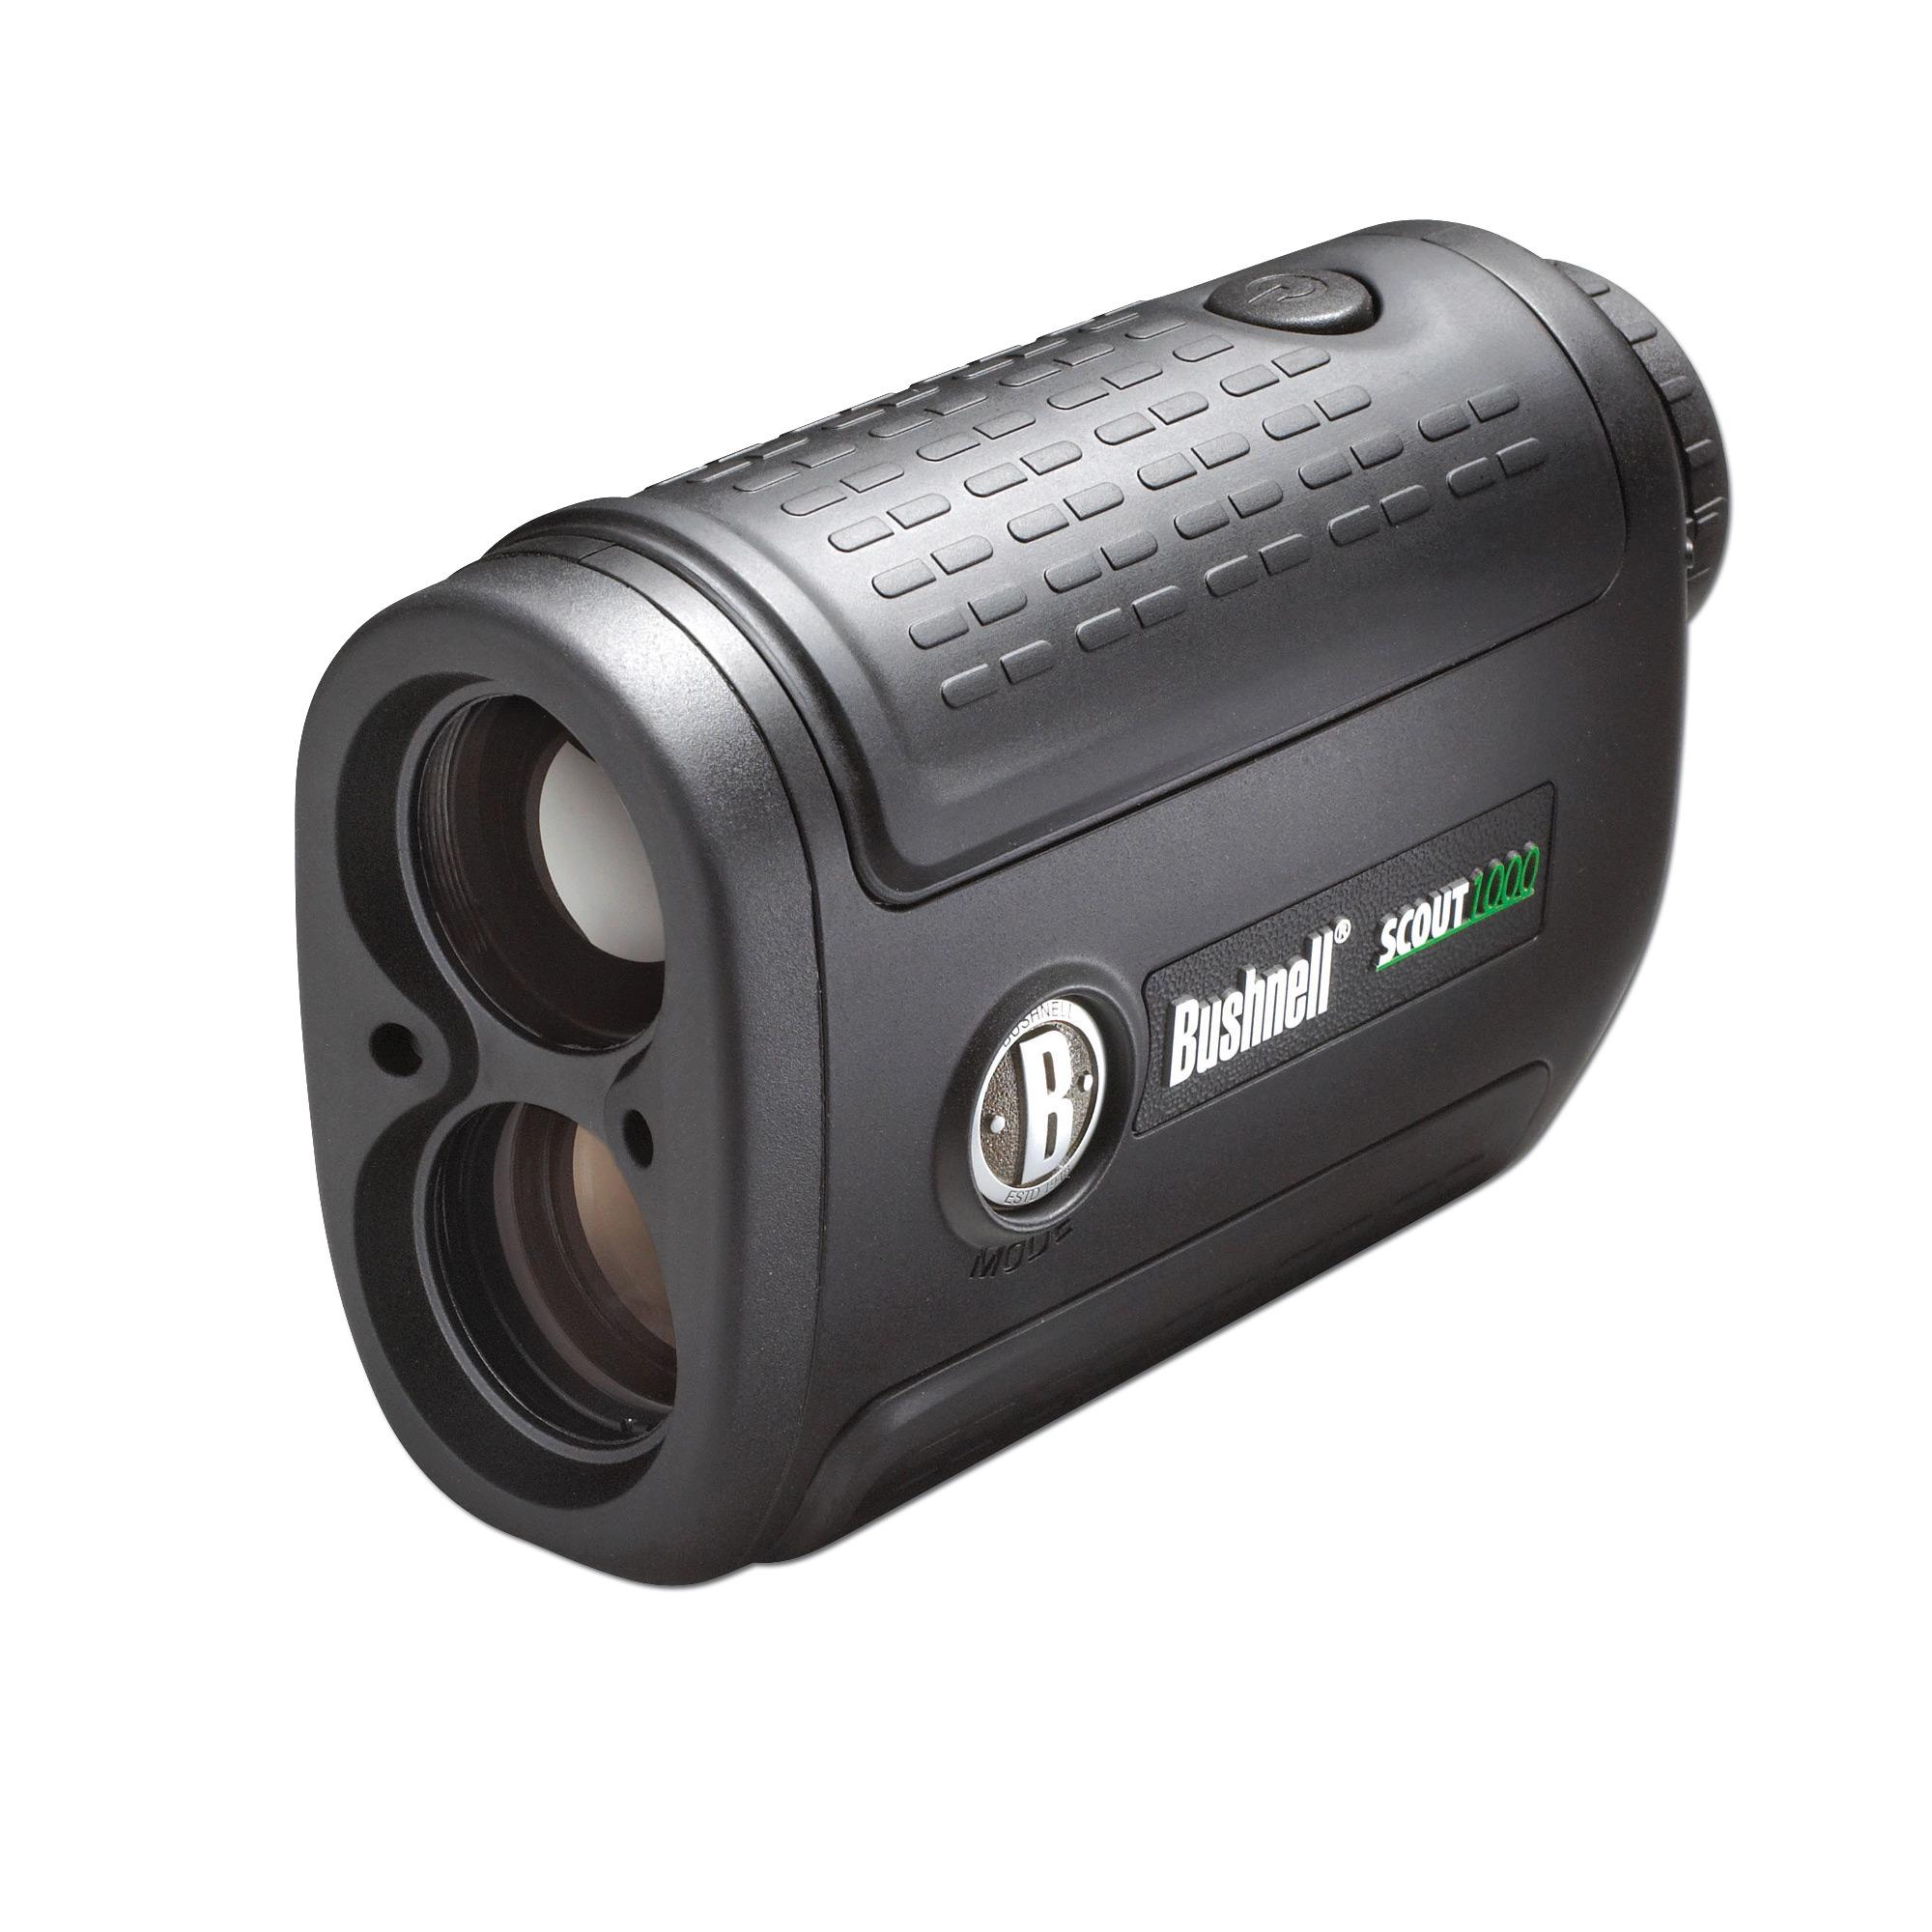 Bushnell Entfernungsmesser YP Scout 1000